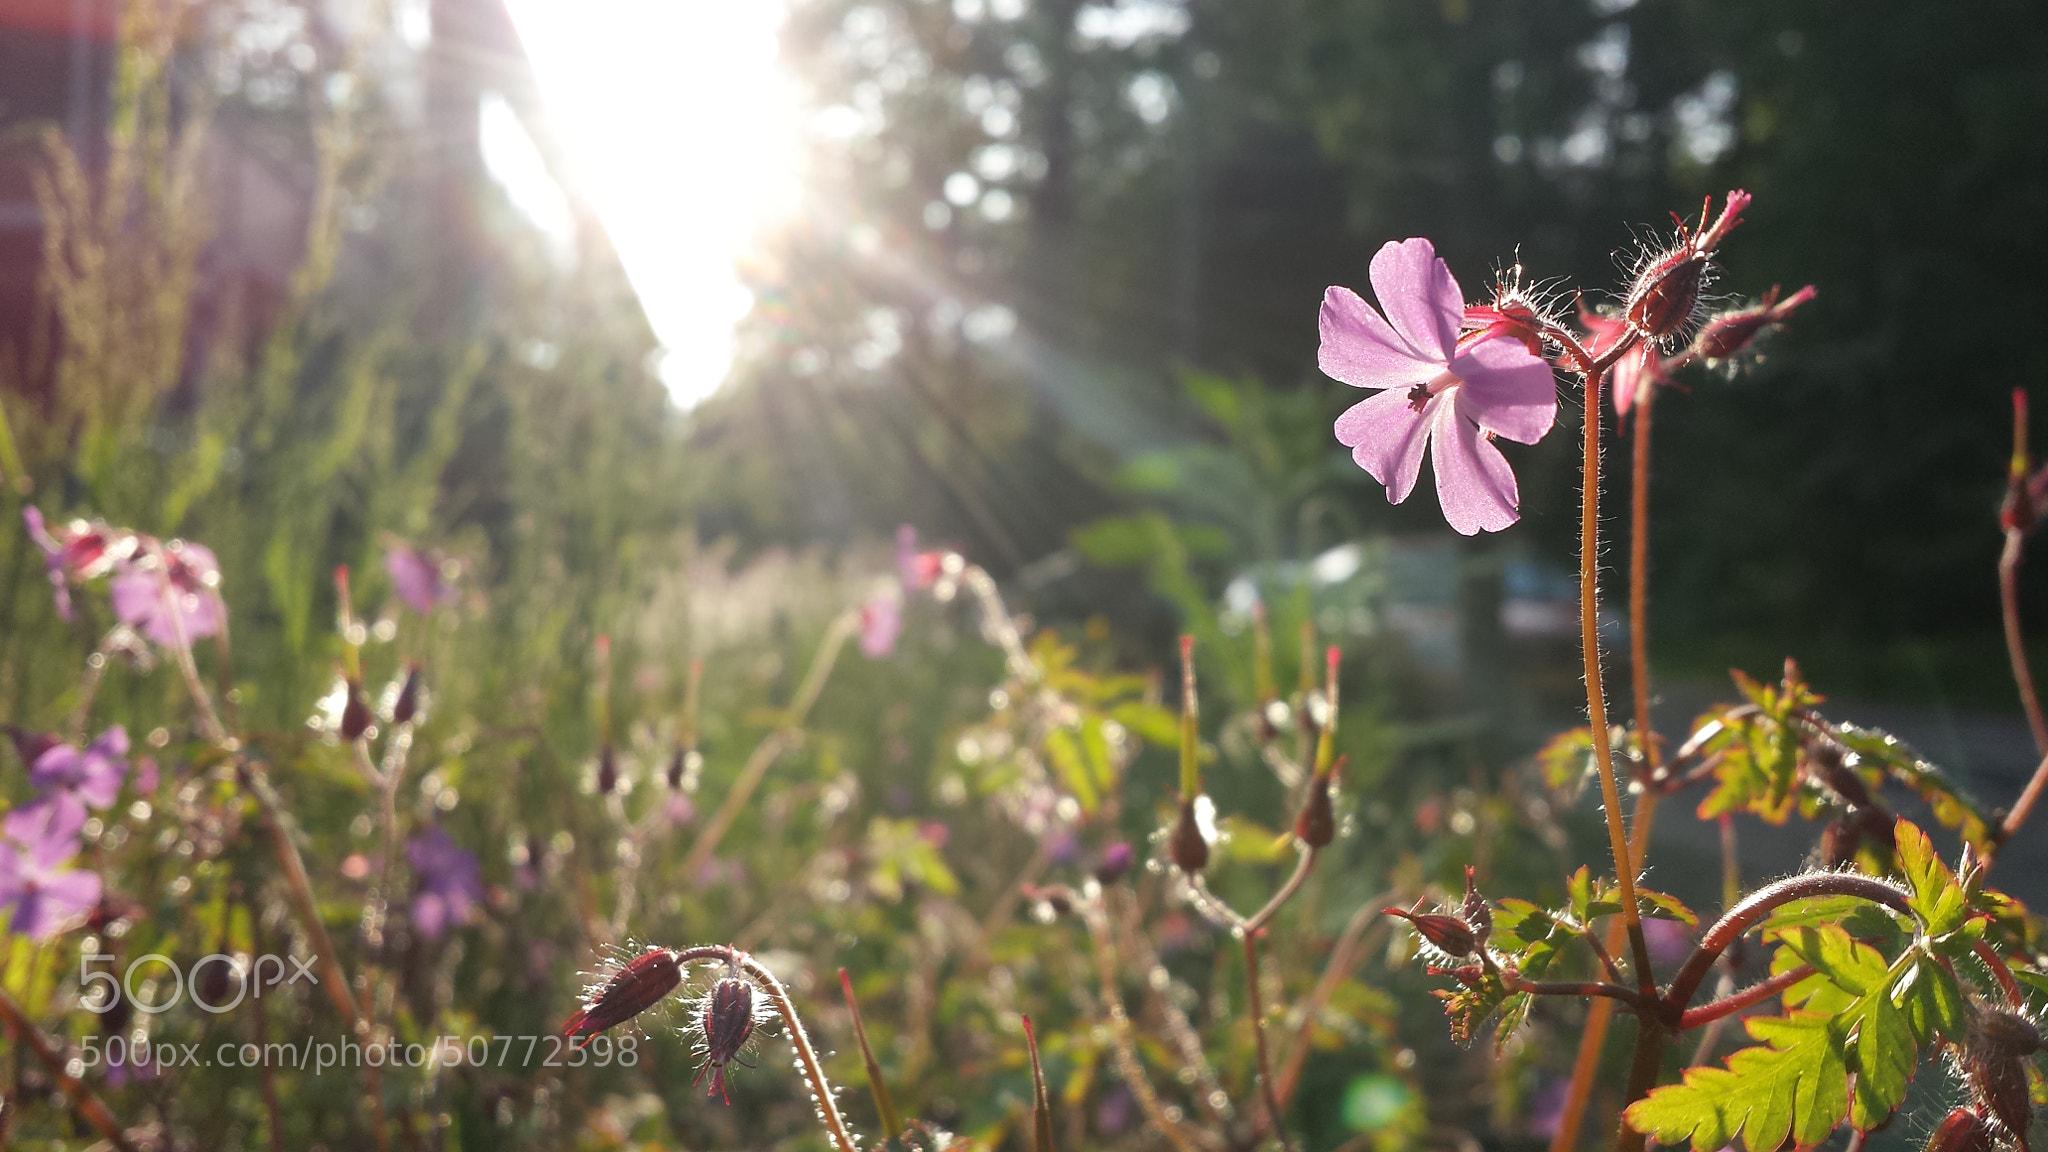 Photograph Lovely Flower by Tashina van Zwam on 500px